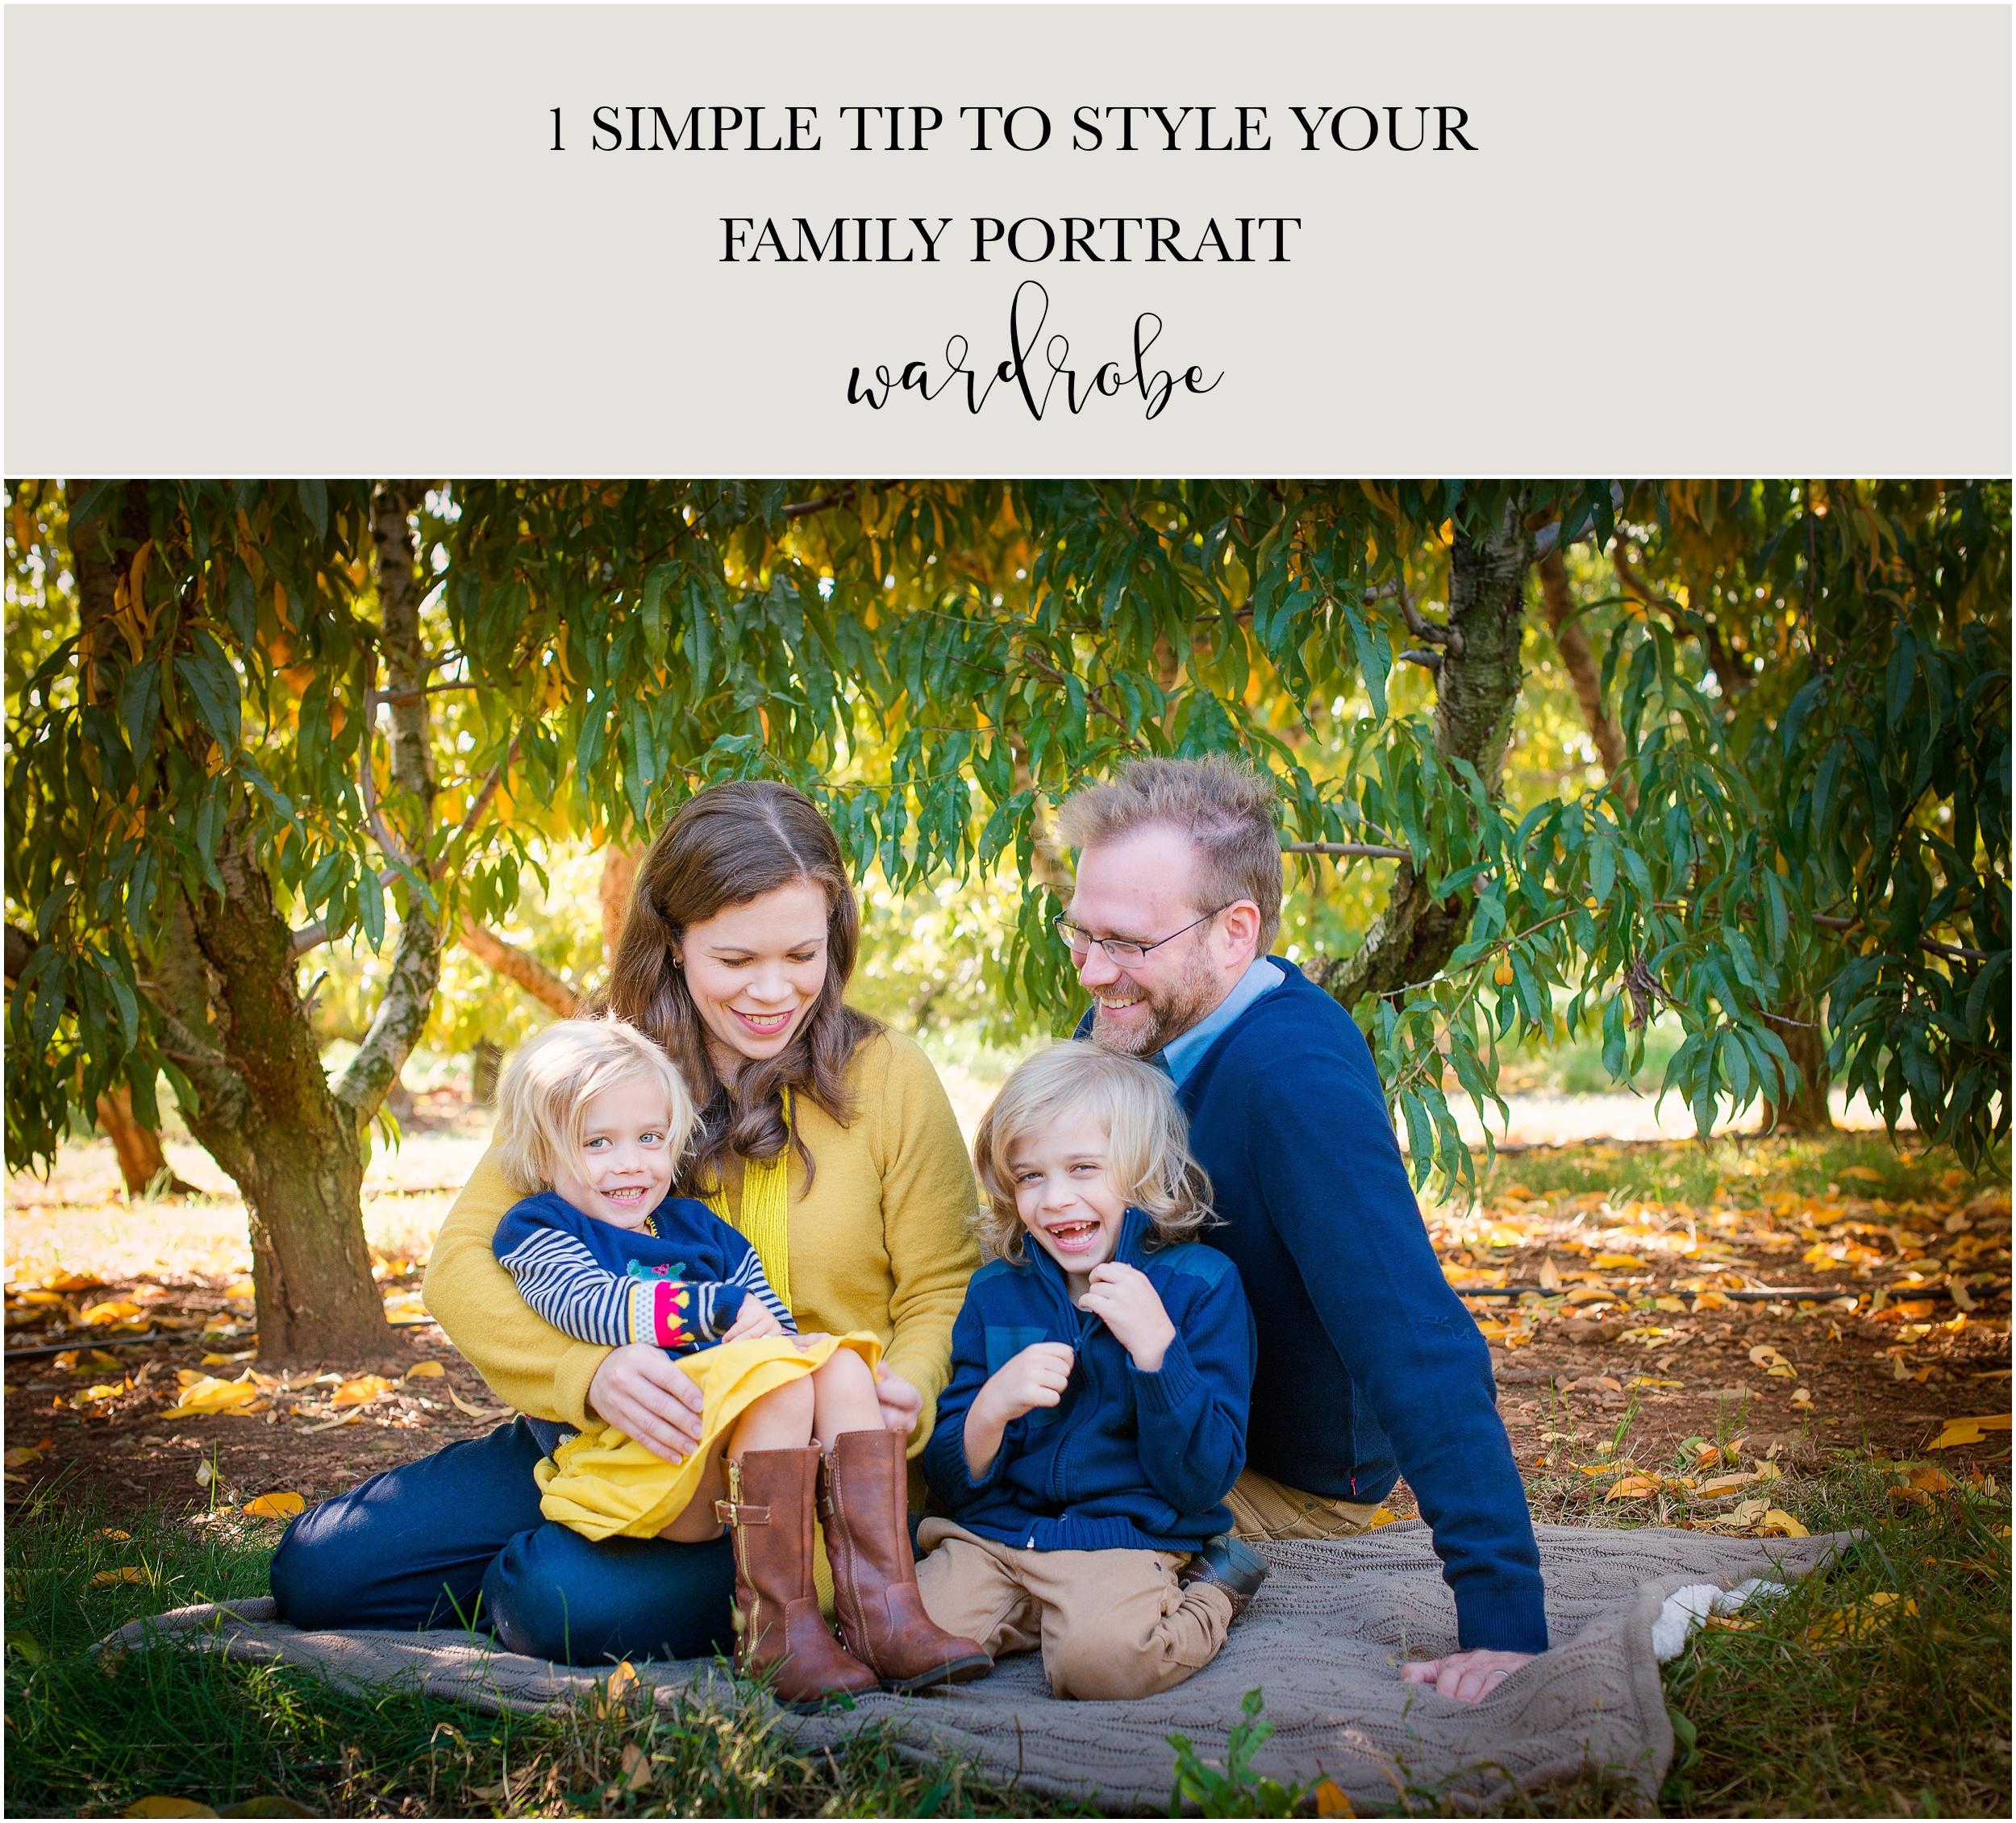 family.portrait.wardrobe.tip